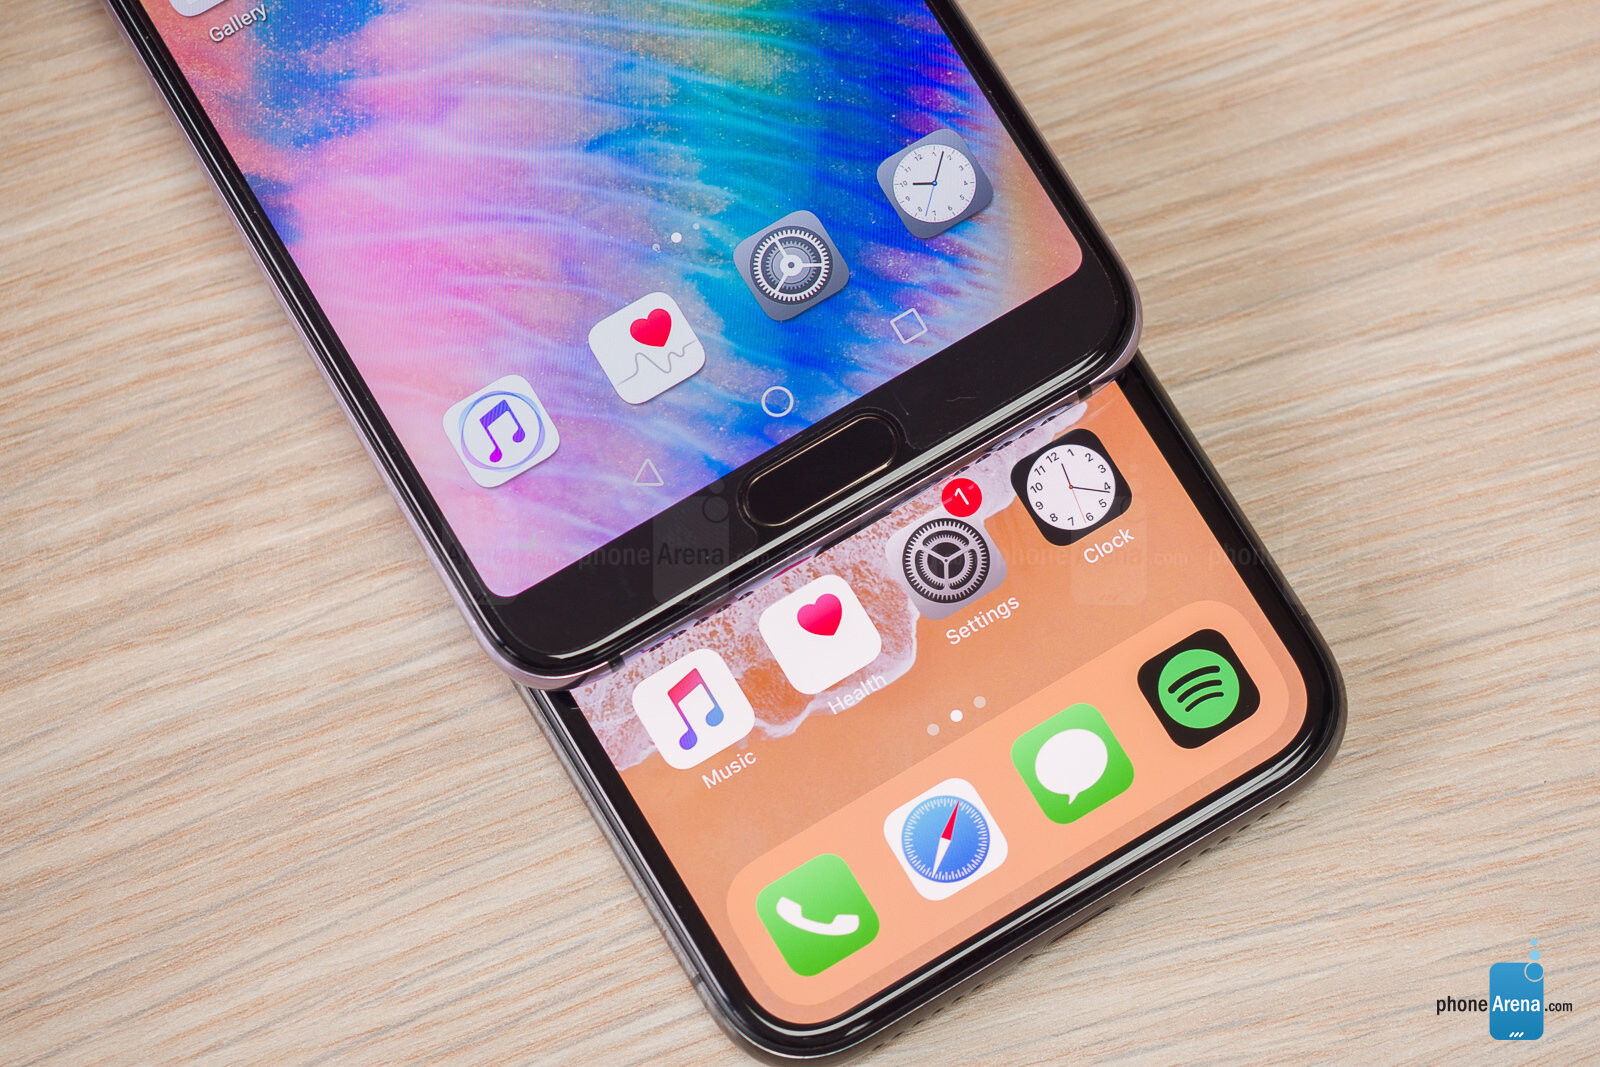 Best Way To Get Videos Off Iphone